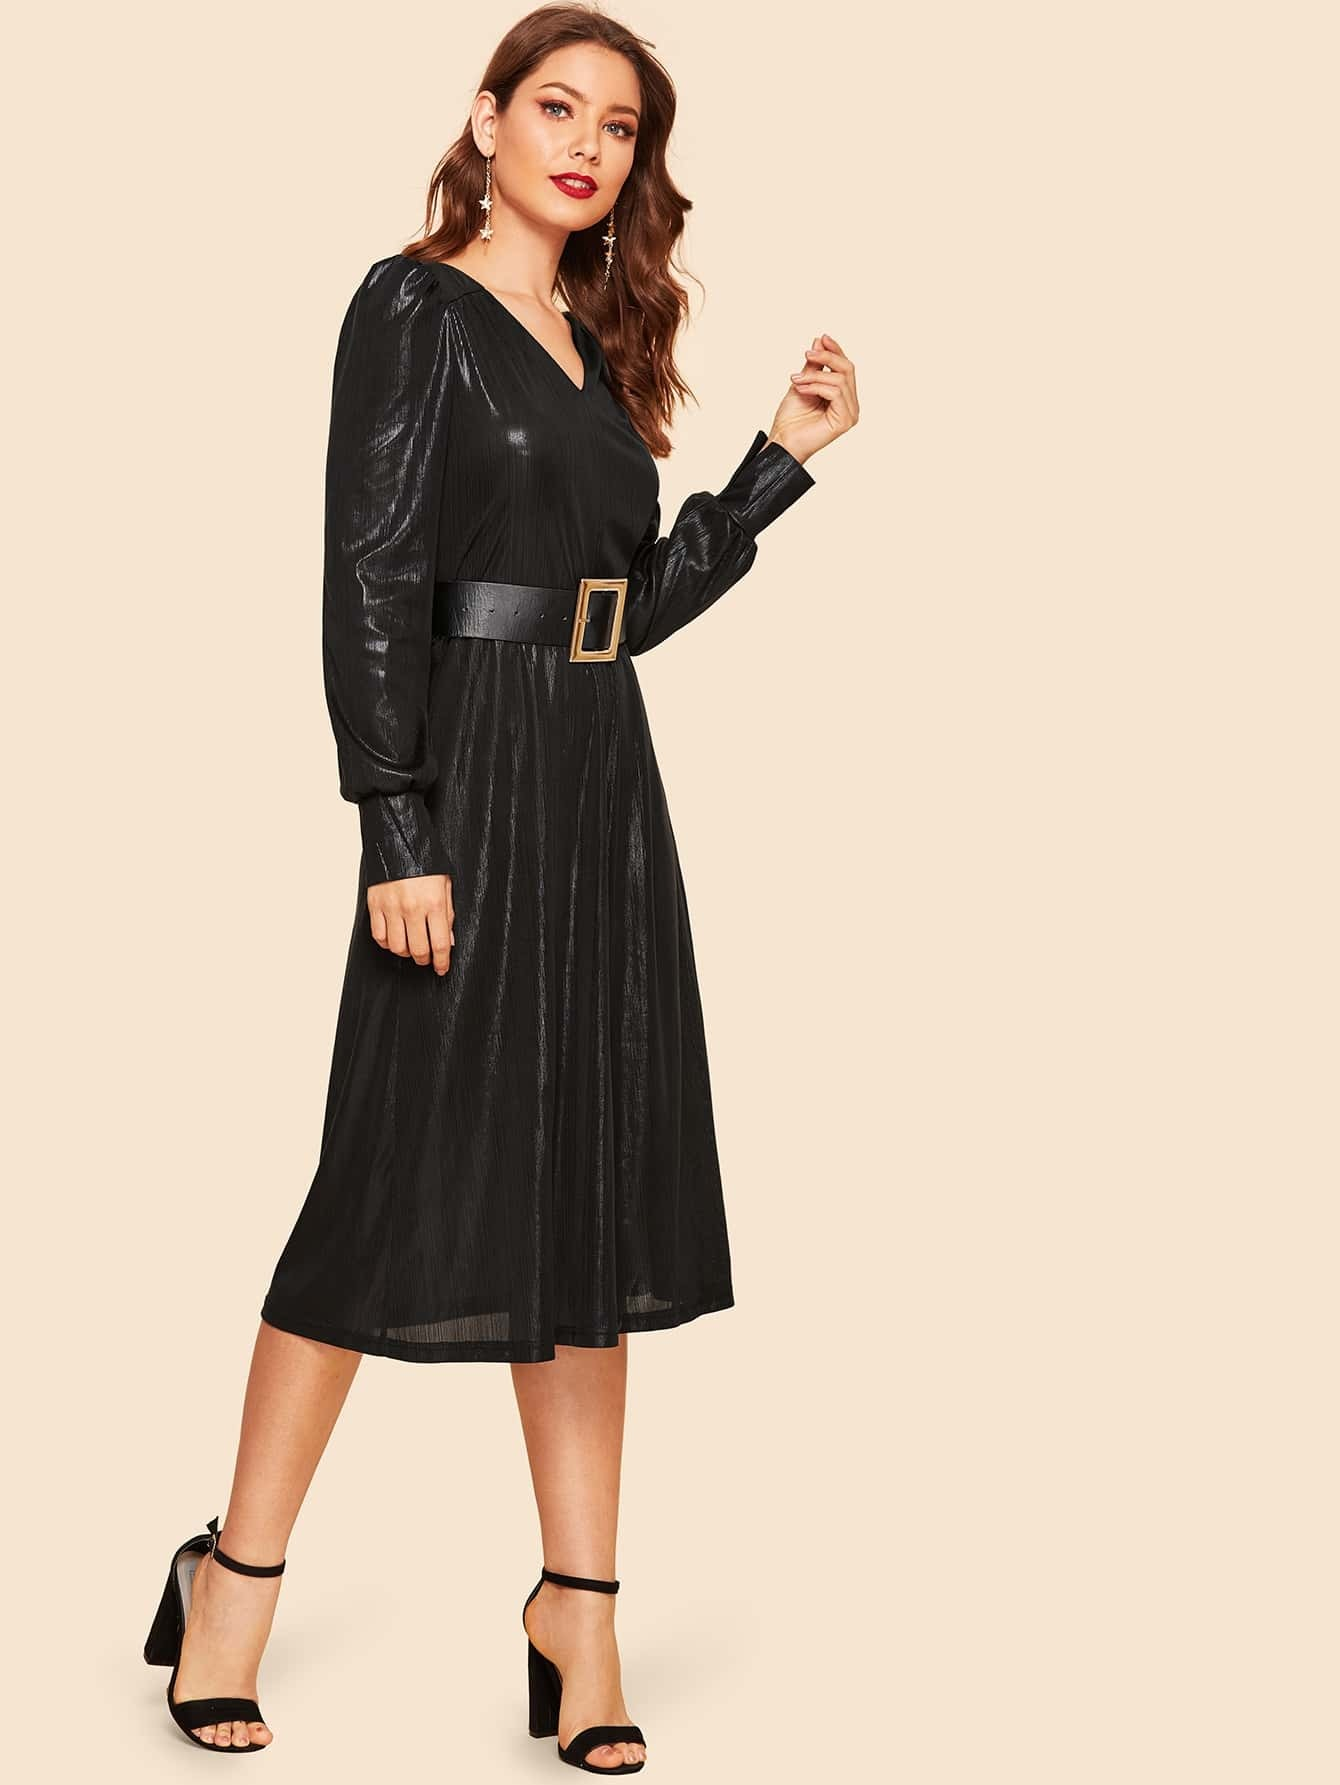 49458869f3ce Cheap Buckle Belt V Cut Metallic Midi Dress for sale Australia | SHEIN